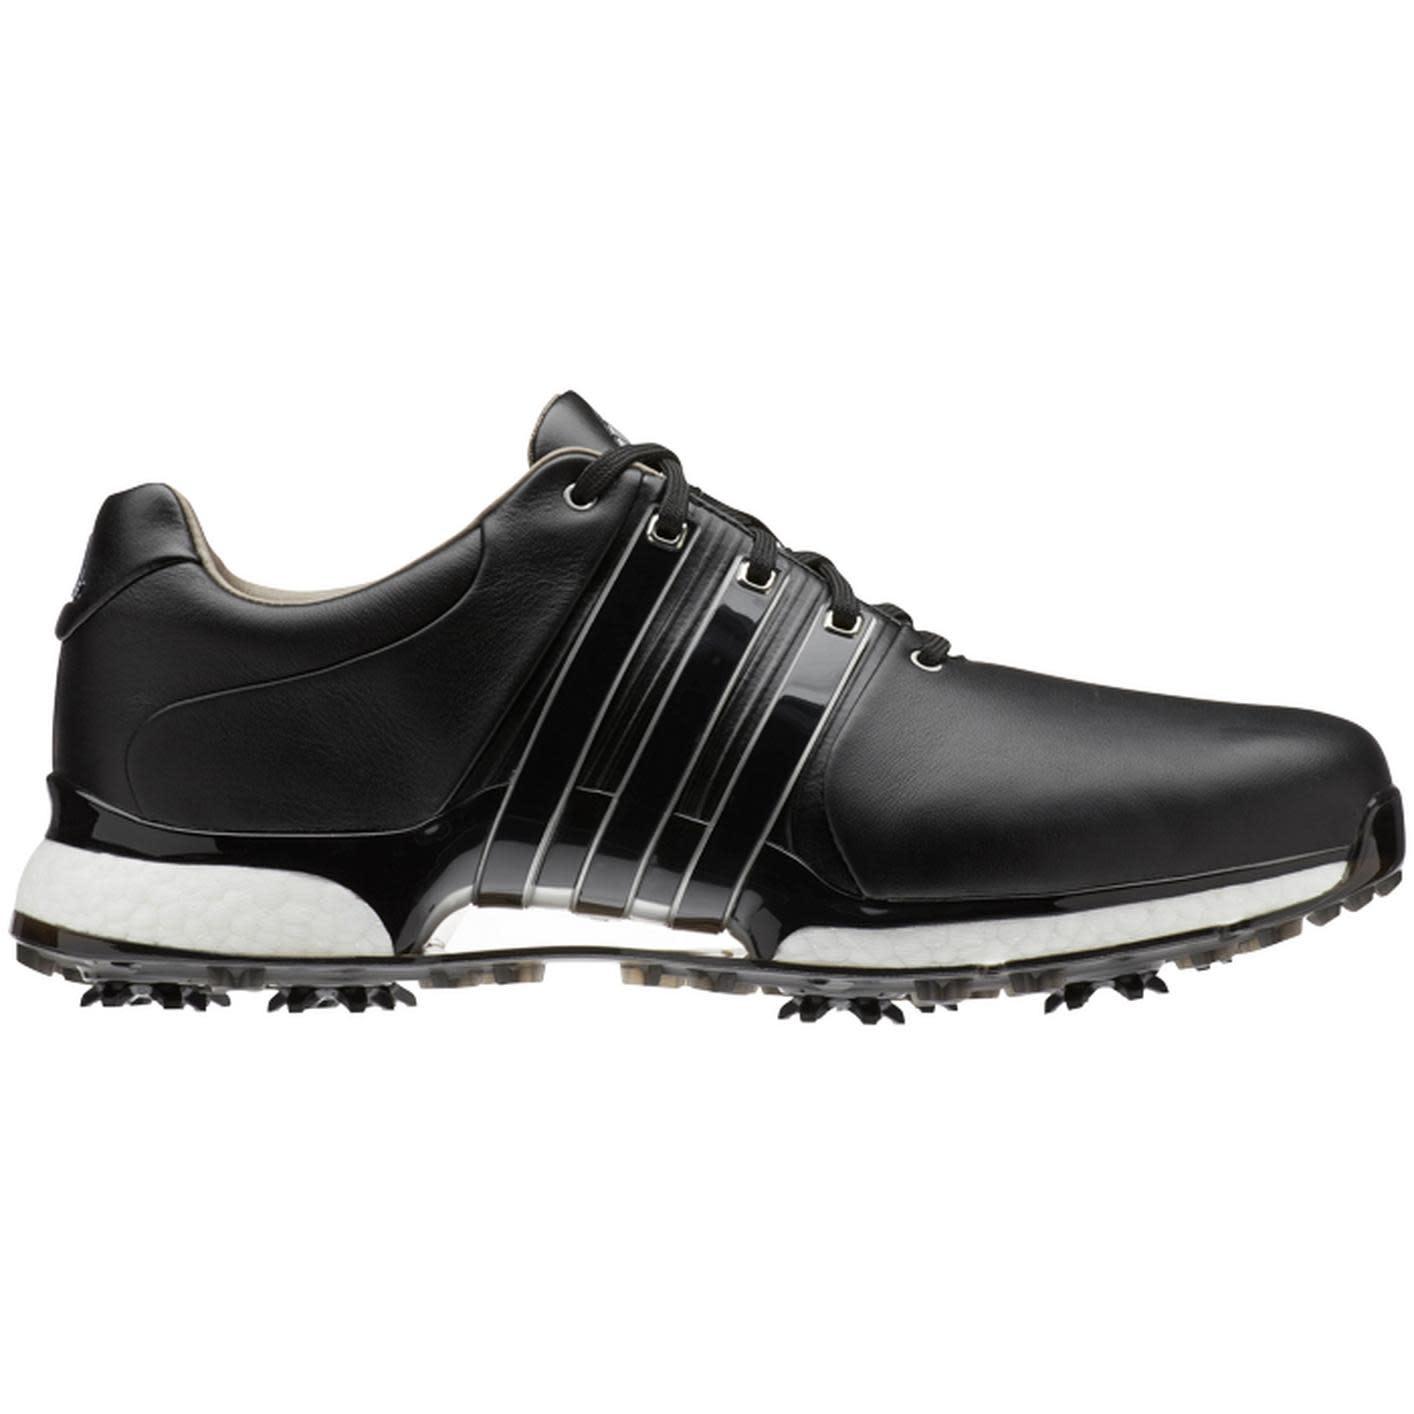 Adidas tour360 xt